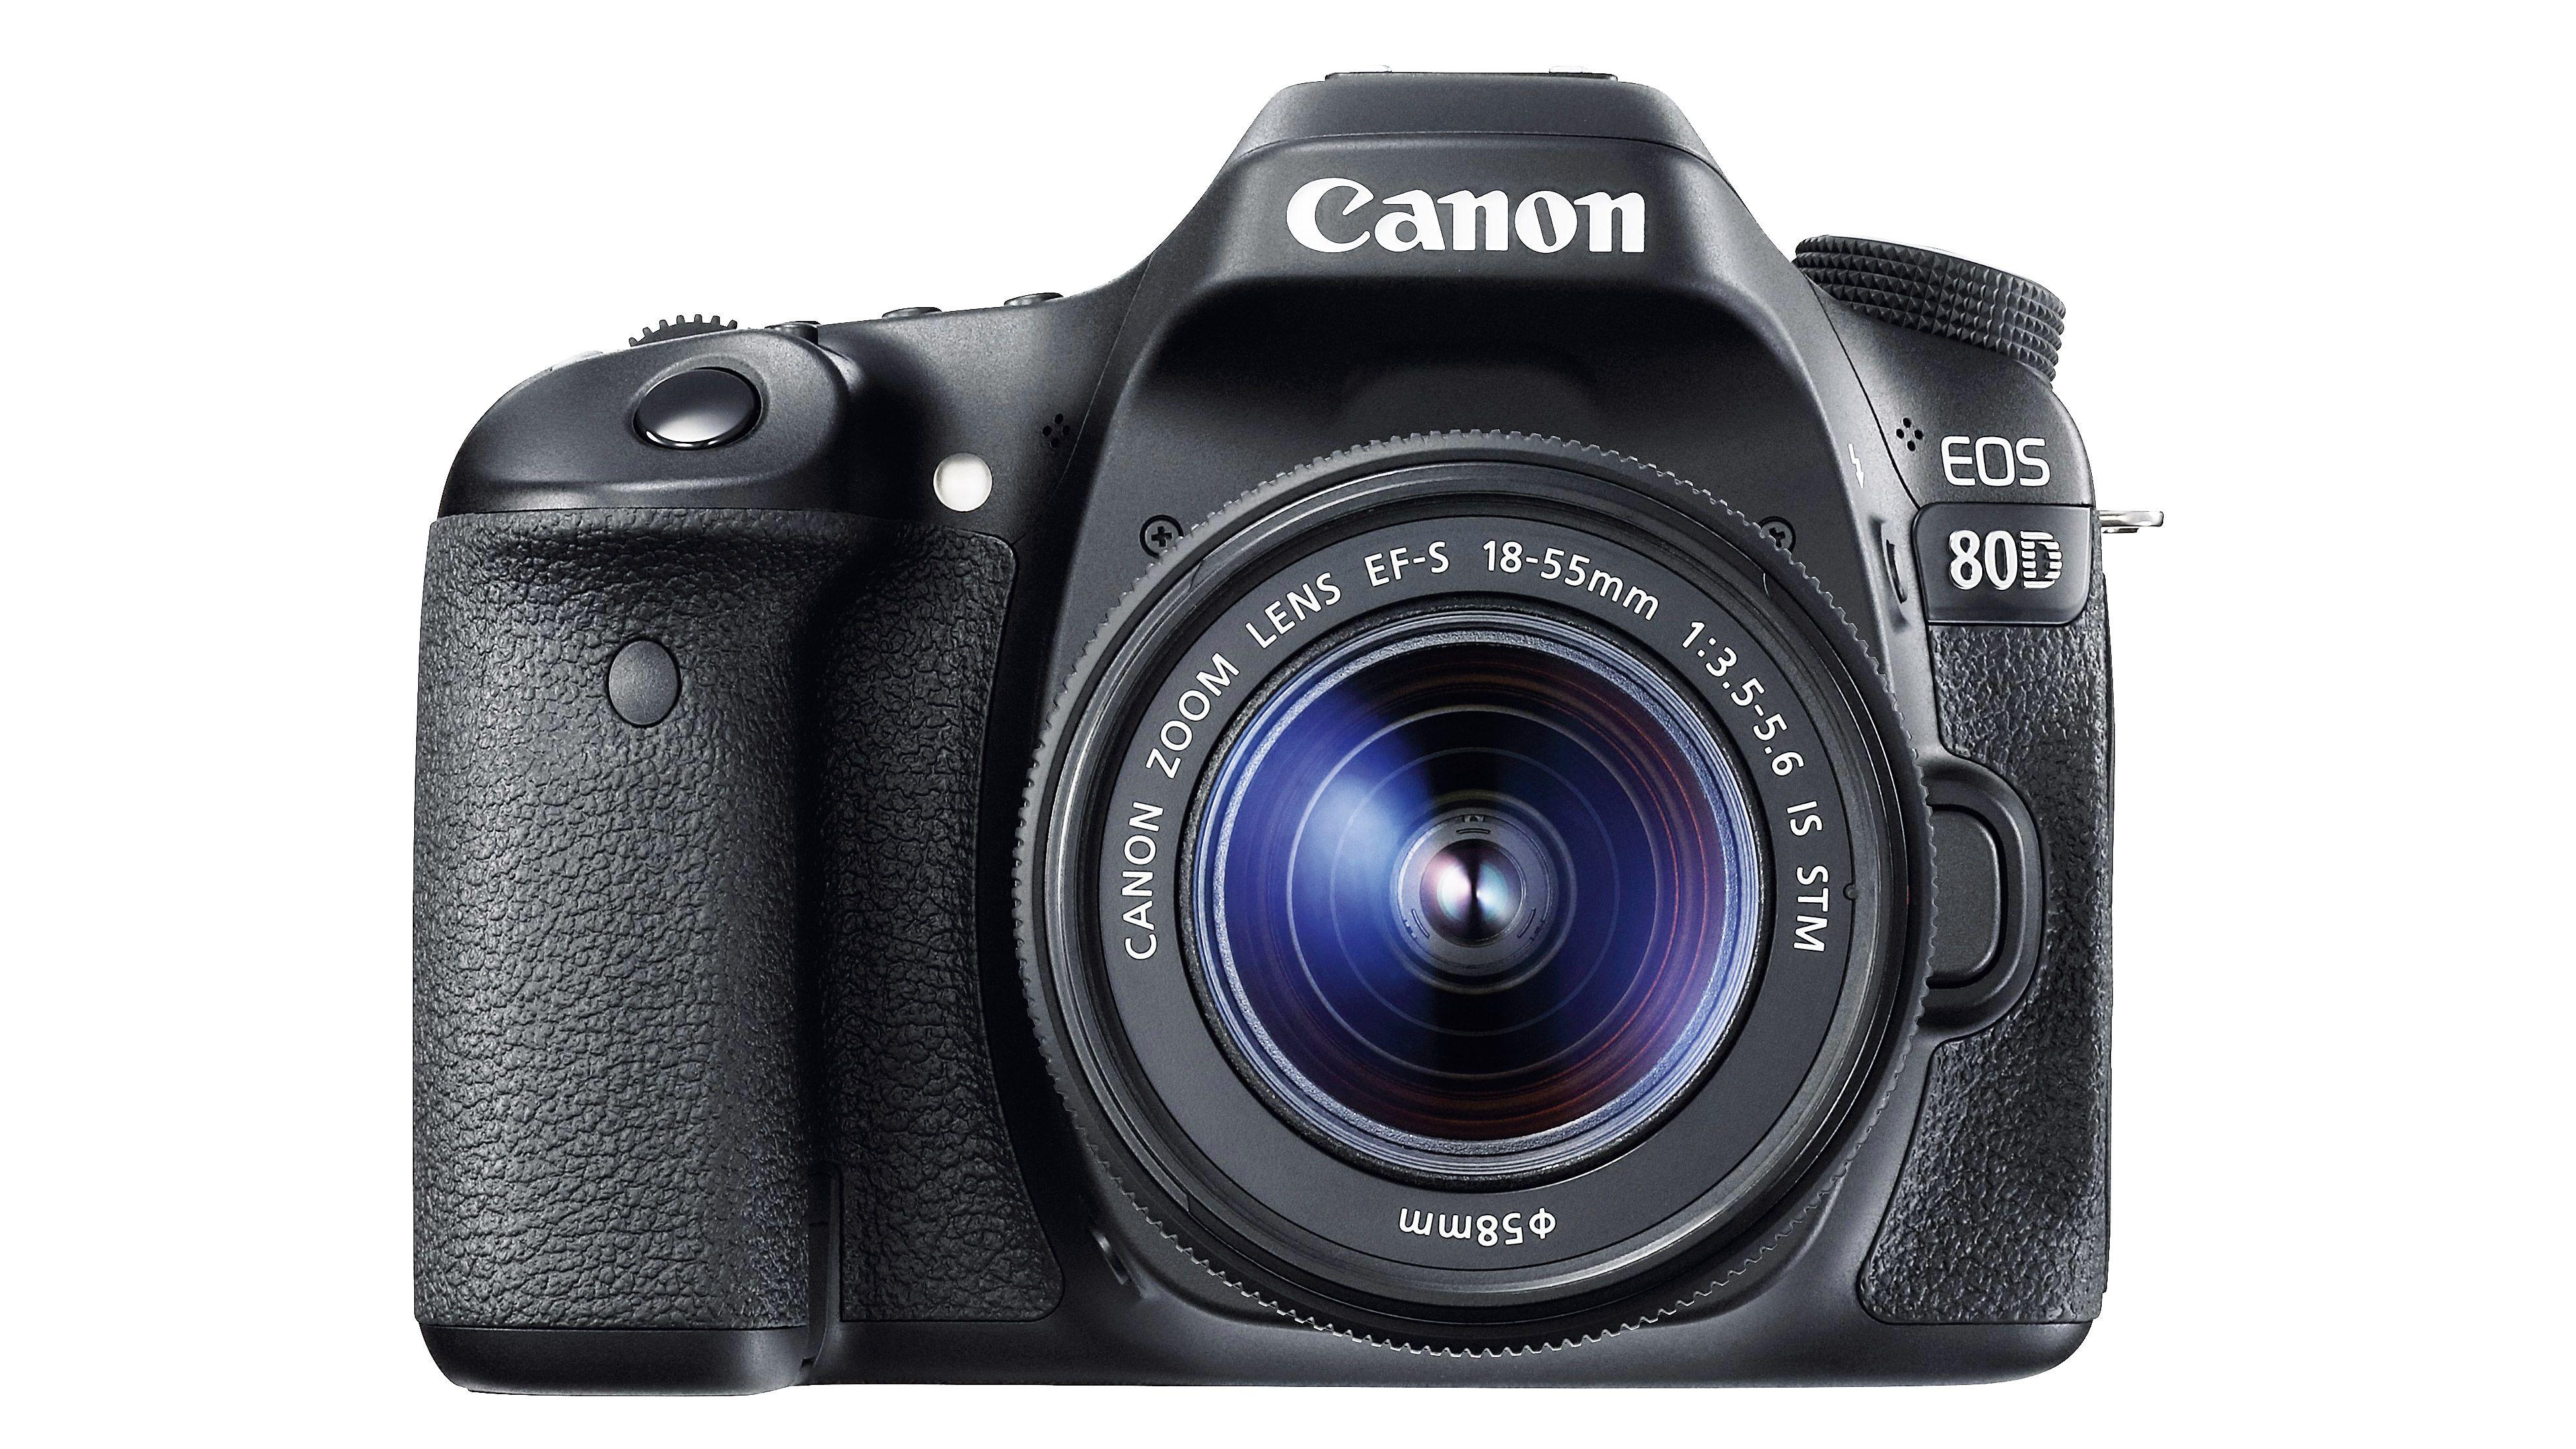 Canon Eos 80d Review Canon Dslr Digital Slr Digital Camera